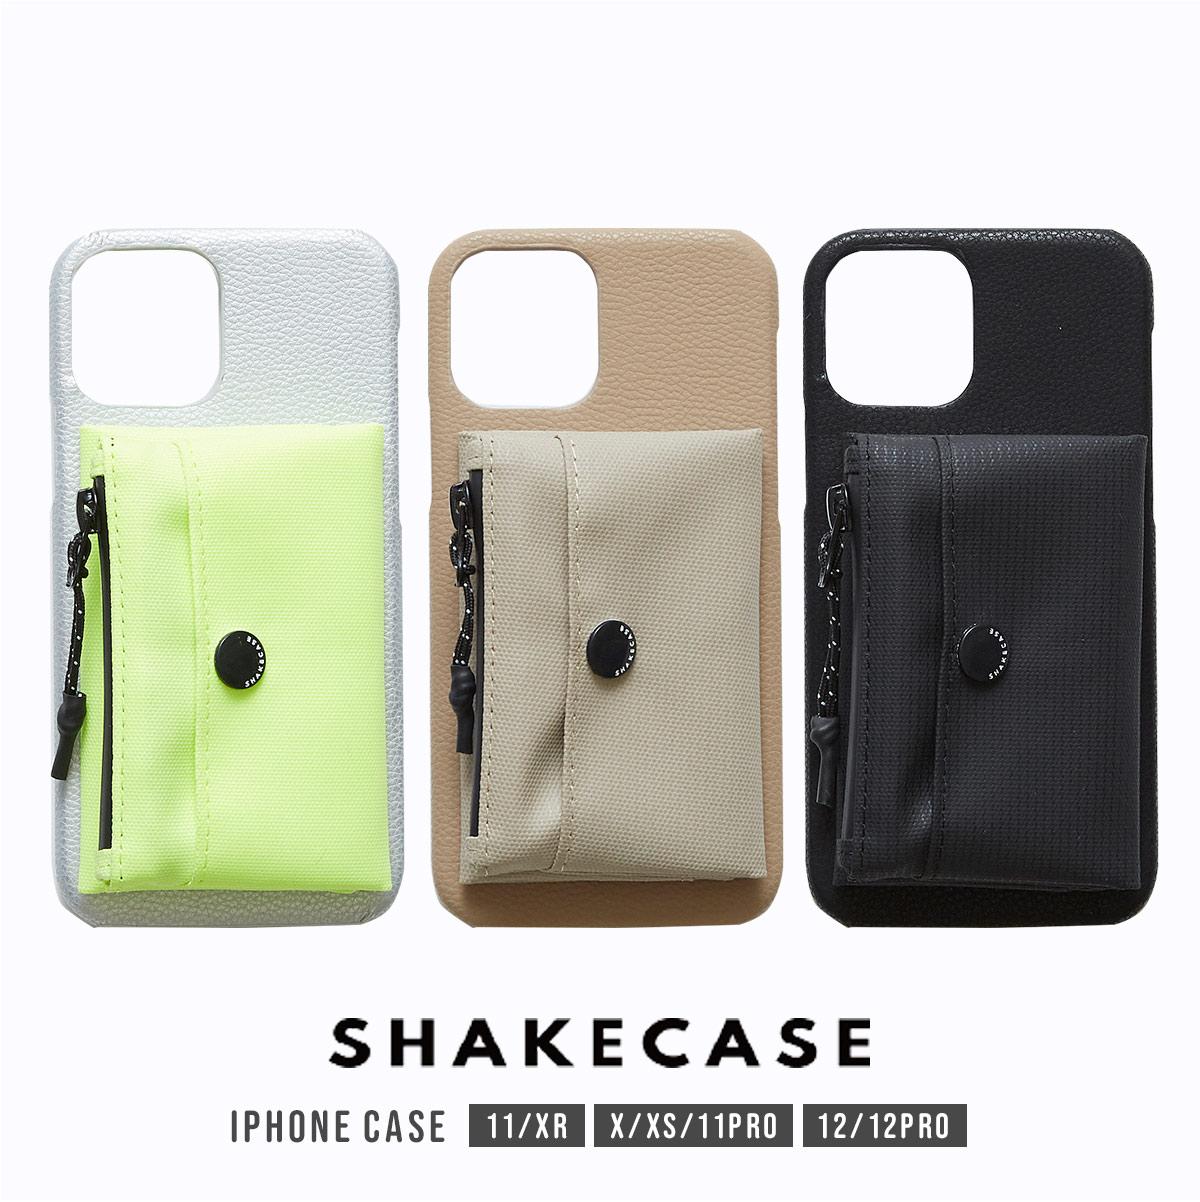 SHAKECASE スマートフォン アイフォン スマホケース 超安い iPhone12 12pro iPhone11 iphoneXR iPhone11pro ポーチ ユニセックス カードホルダー 日本最大級の品揃え お財布 シェイクケース 送料無料 メンズ レディース メール便